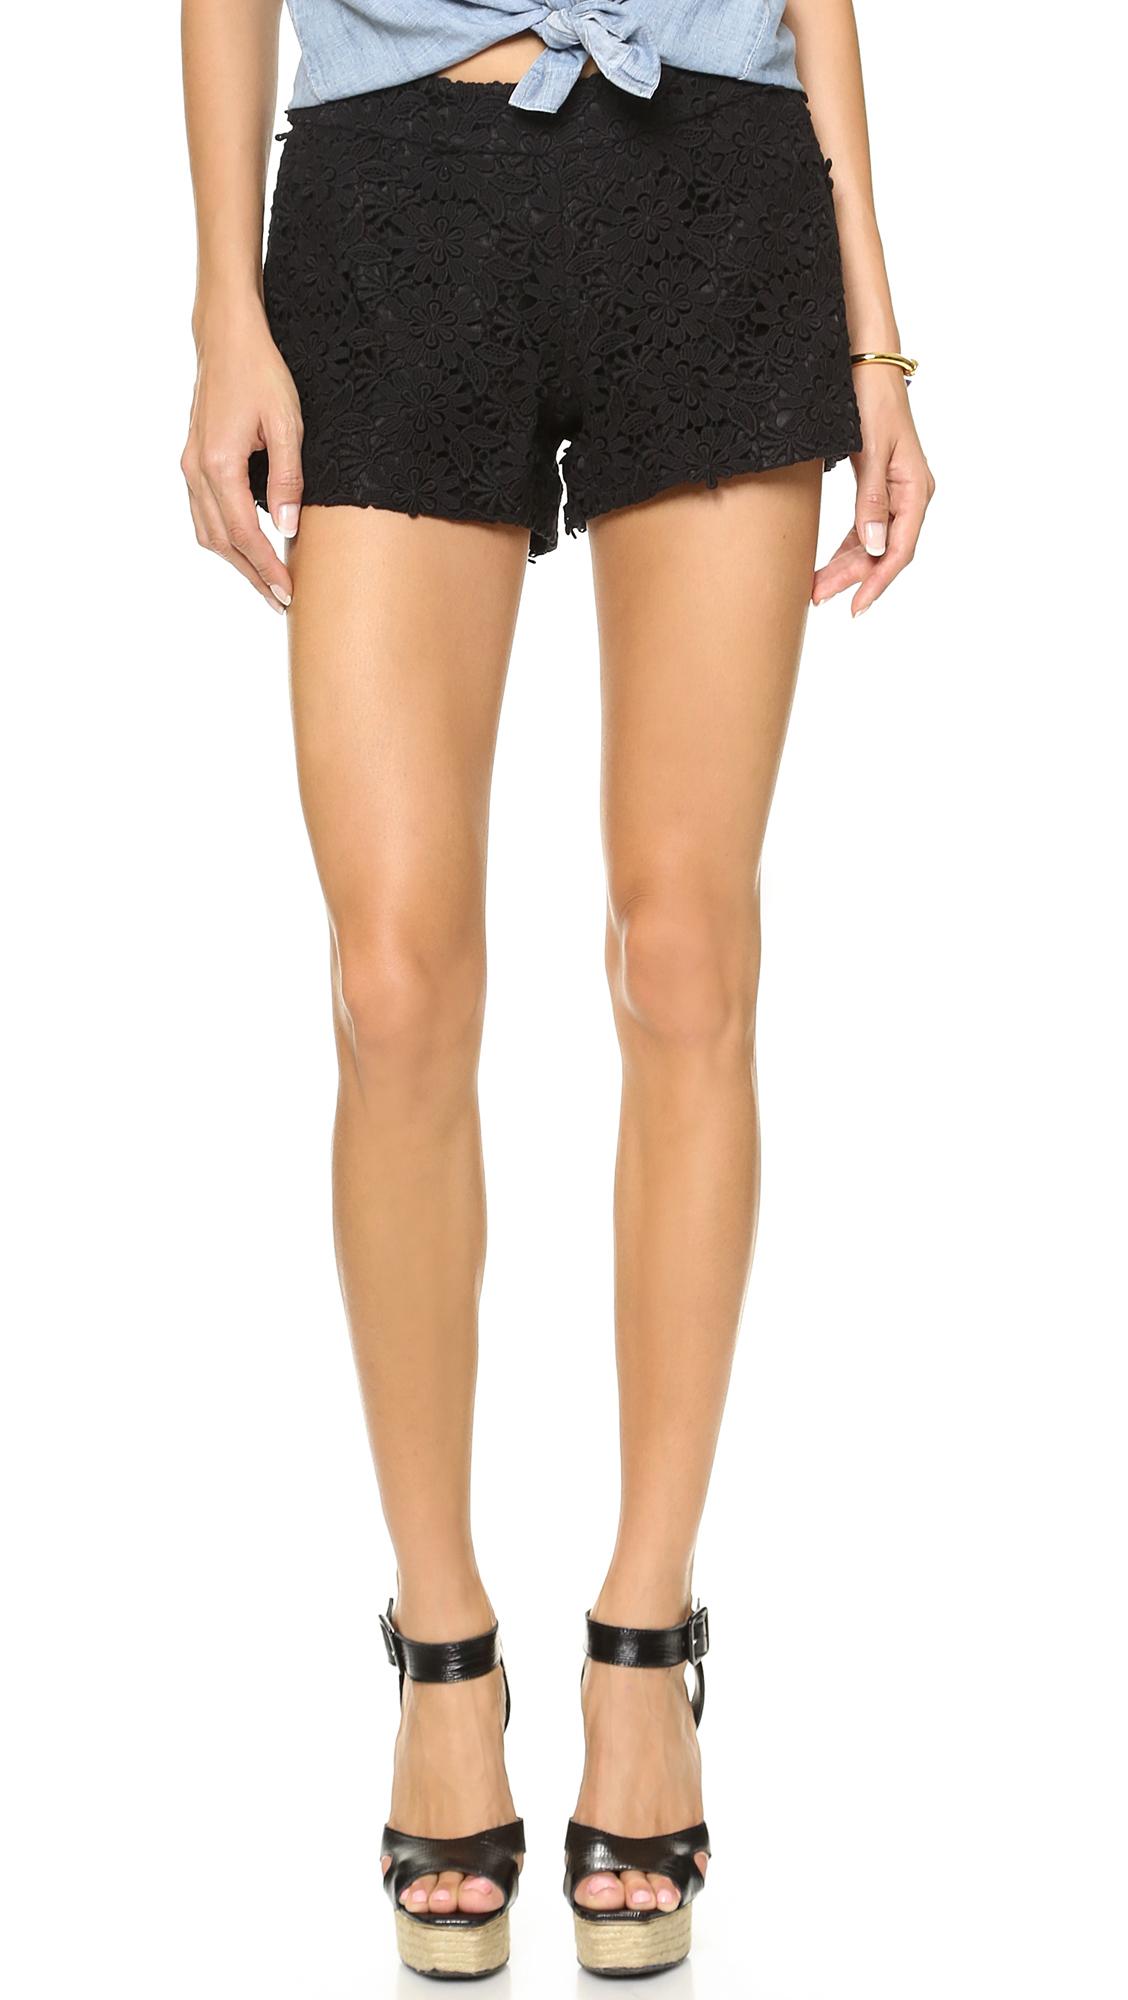 tailored shorts - Black Alice & Olivia fyJrz31s